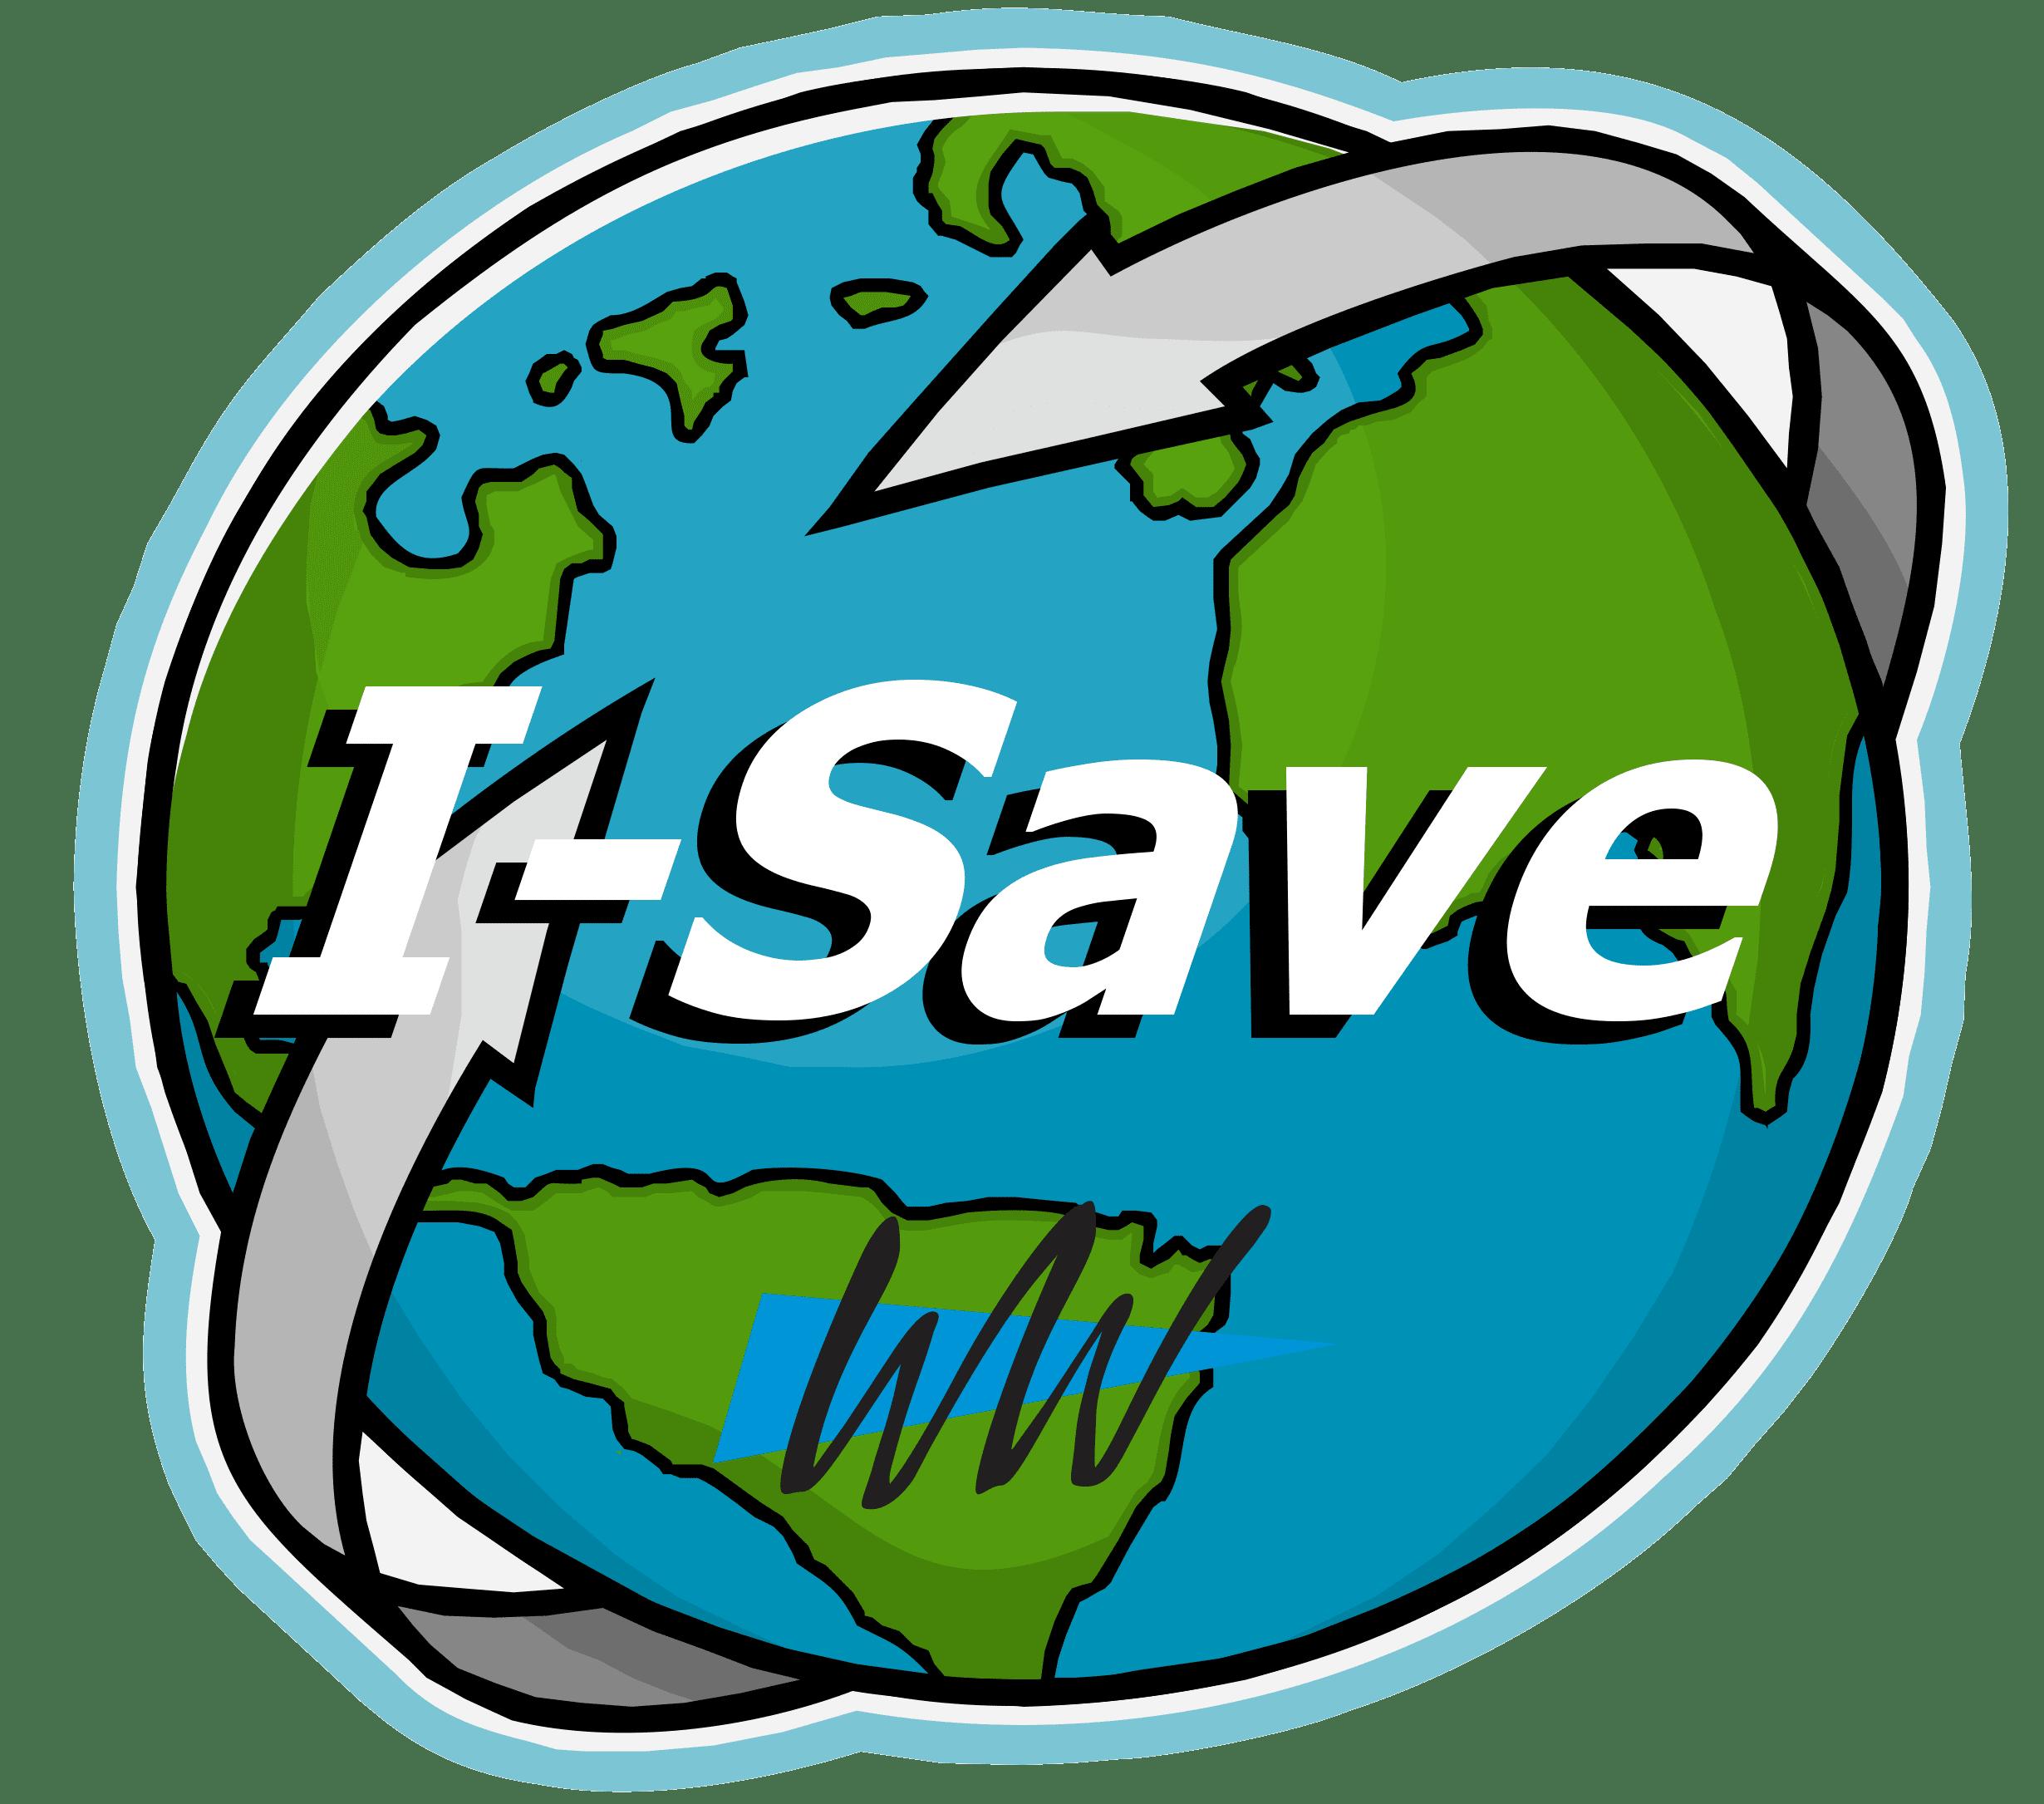 Wayne-Westland I-Save